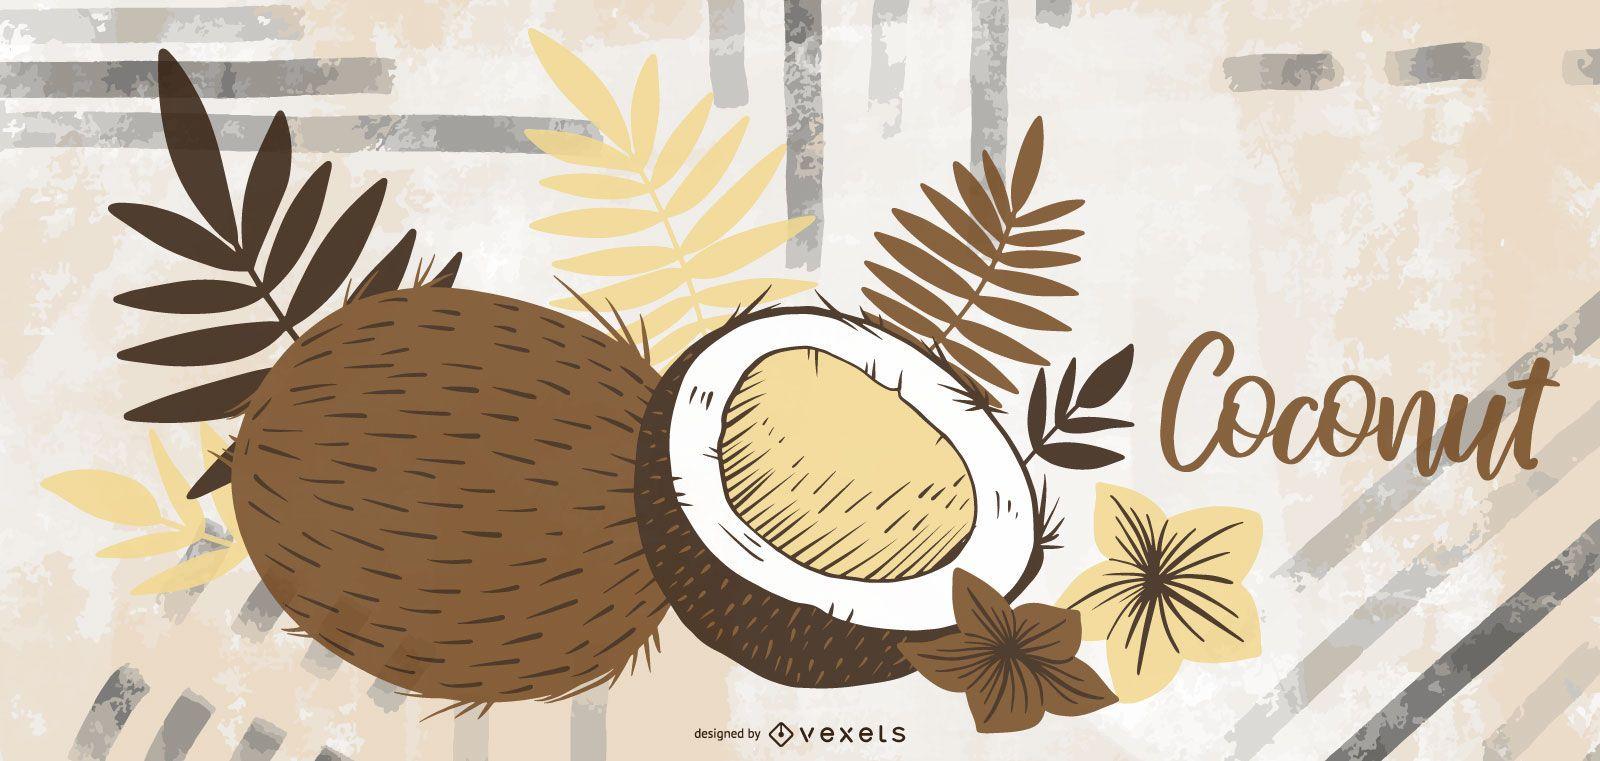 Coconut hand drawn illustration